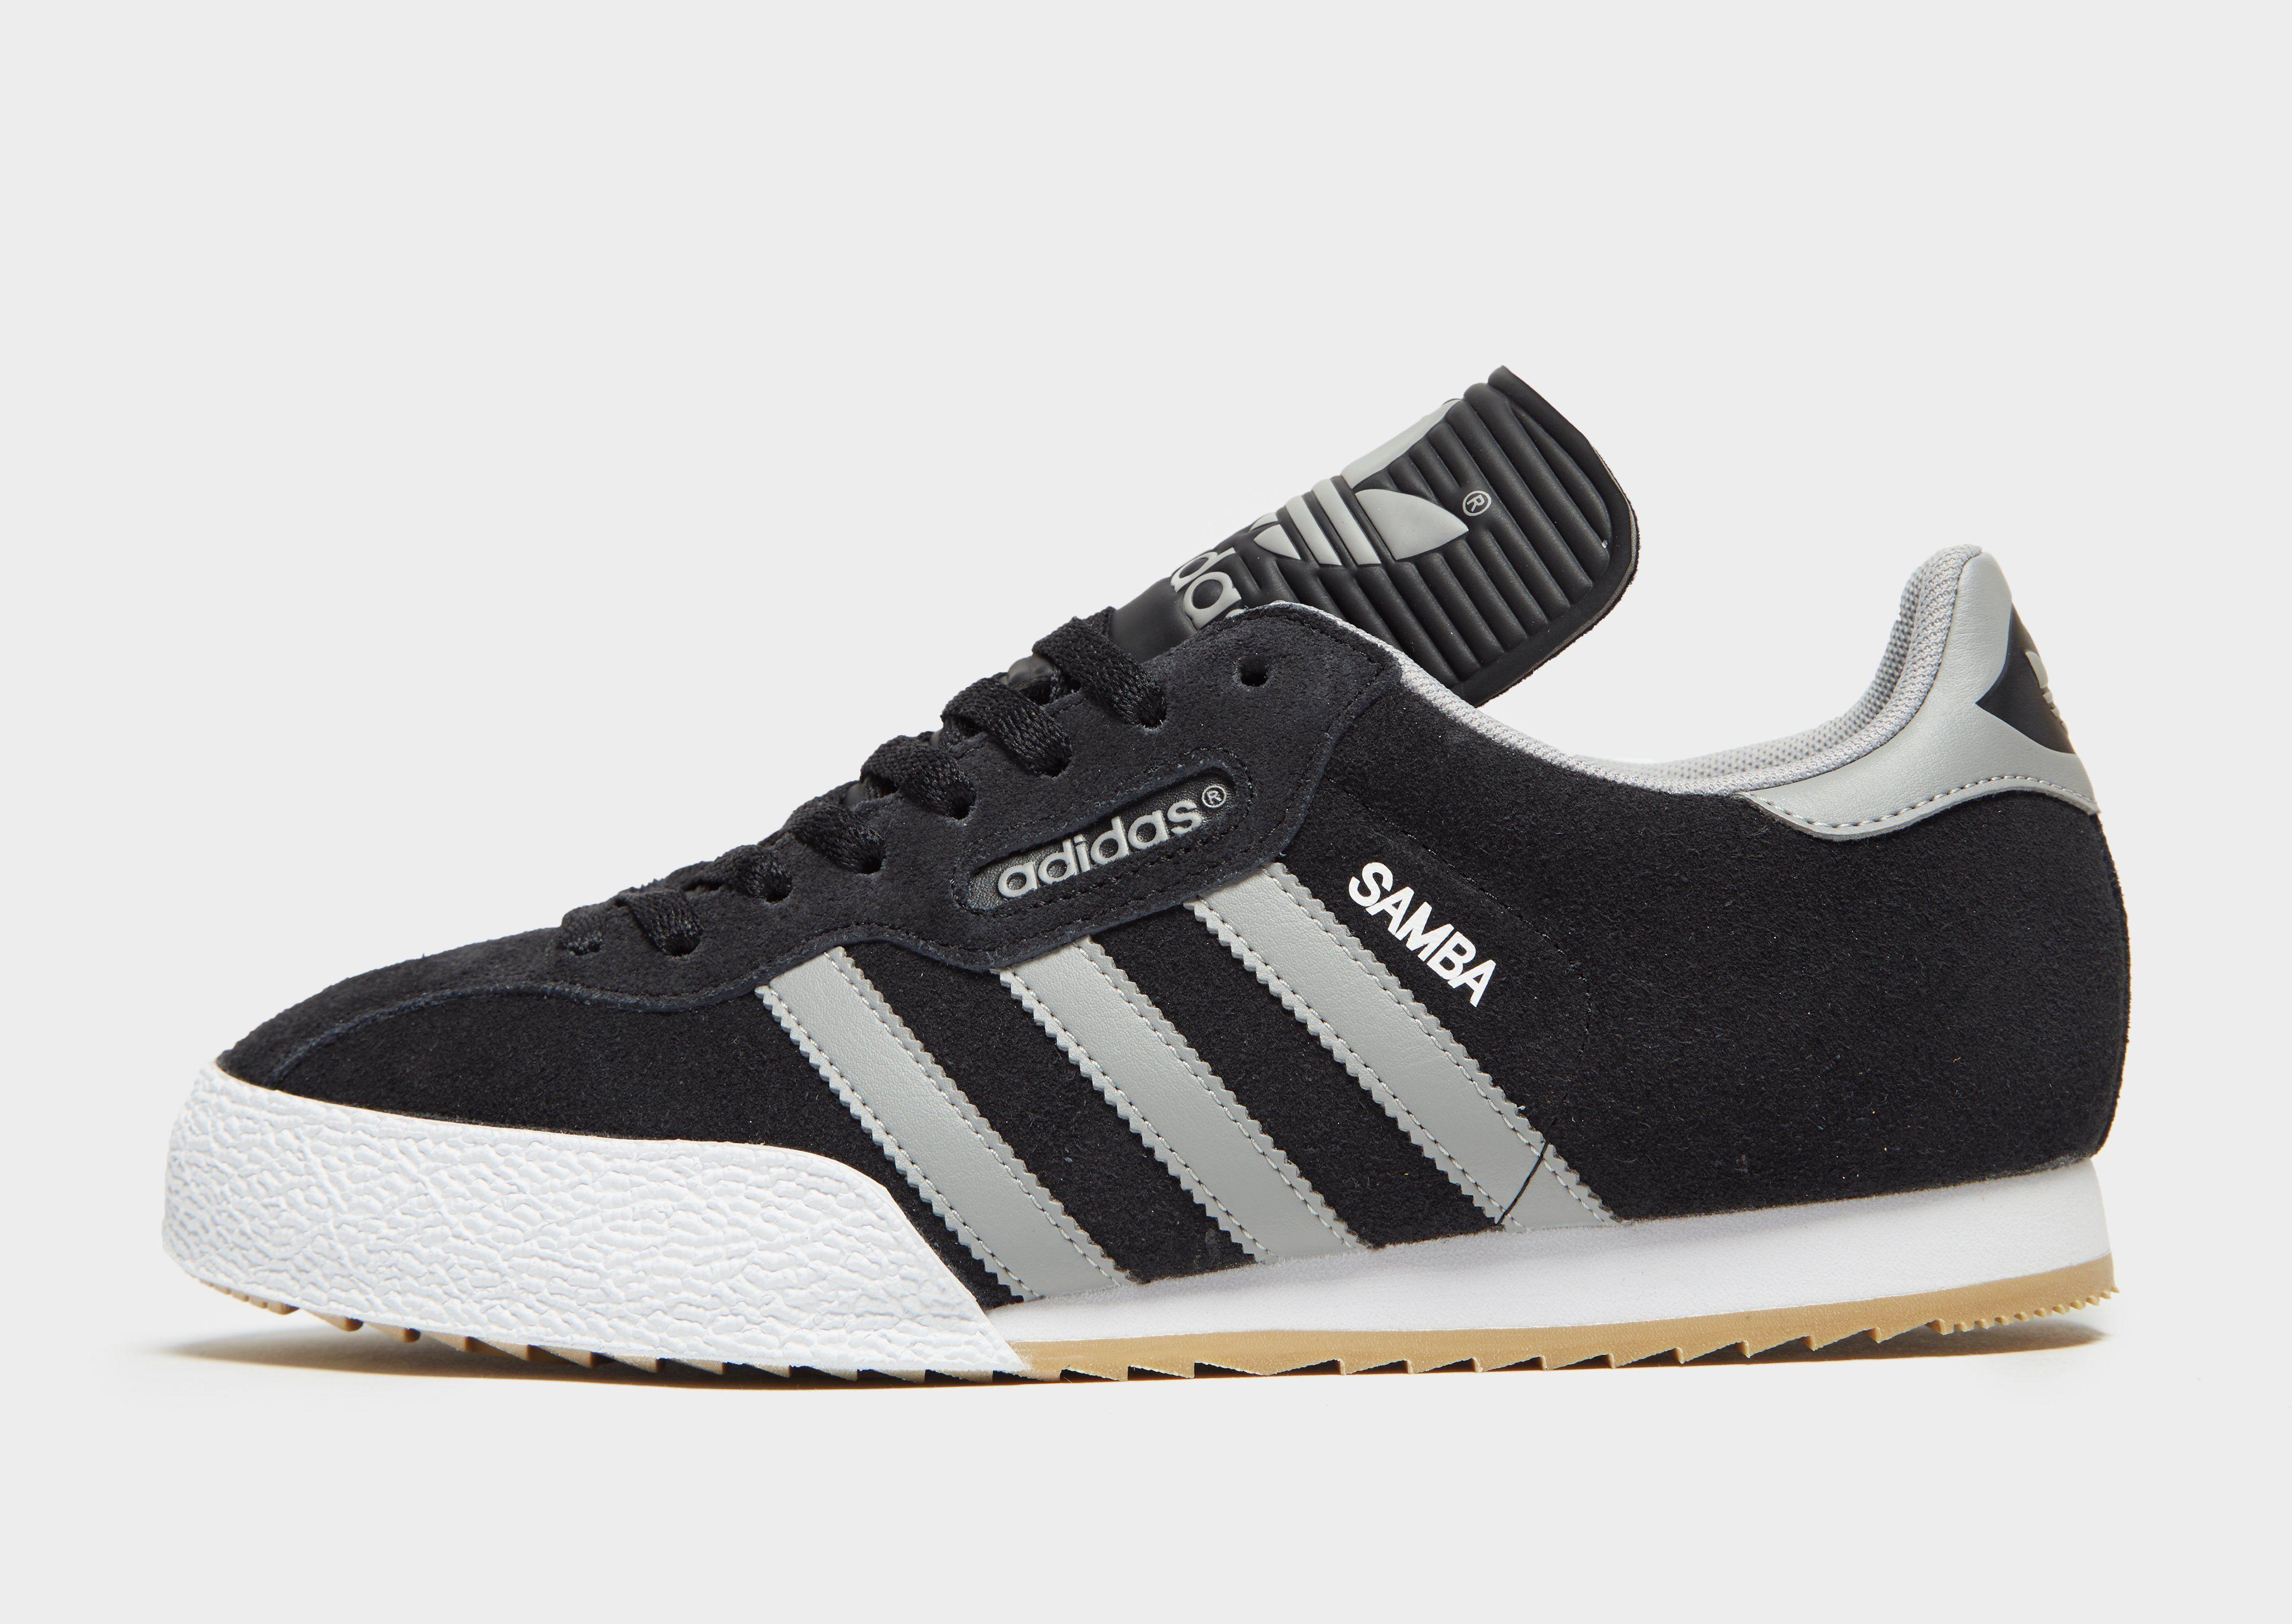 Kleding en accessoires Heren: schoenen Adidas Samba Classic